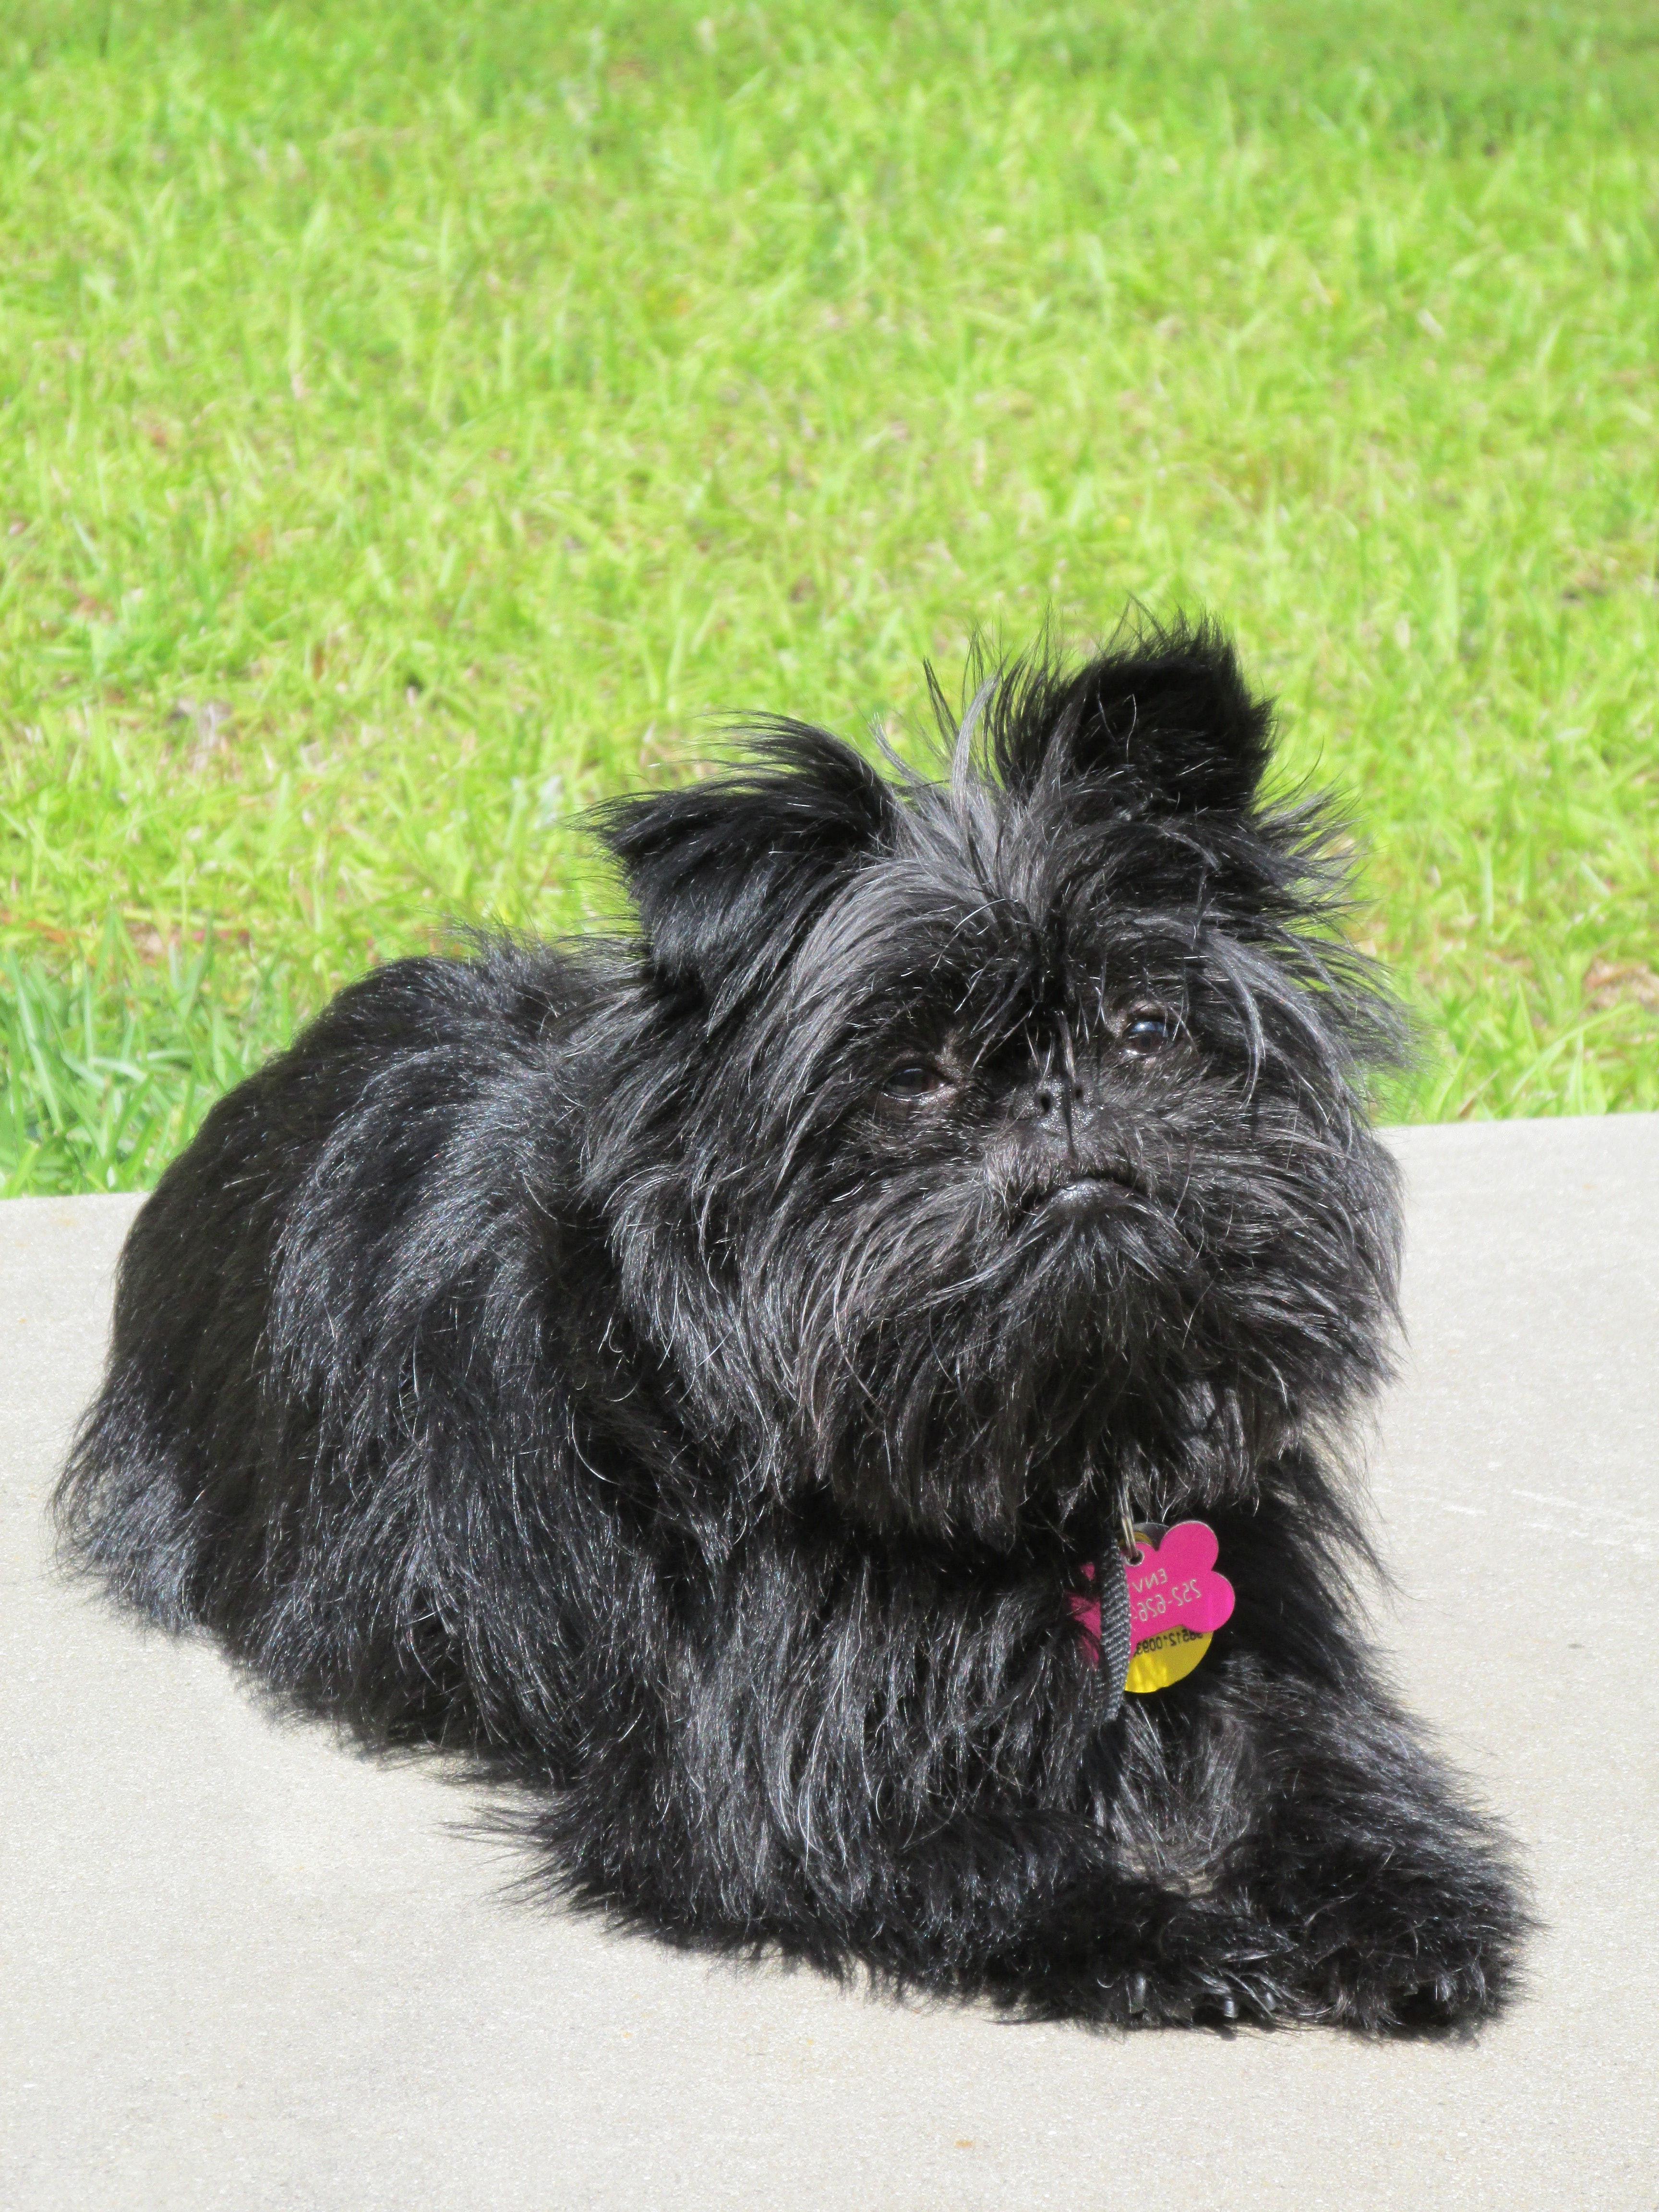 black affenpinscher monkey dog courtesy of pixabay